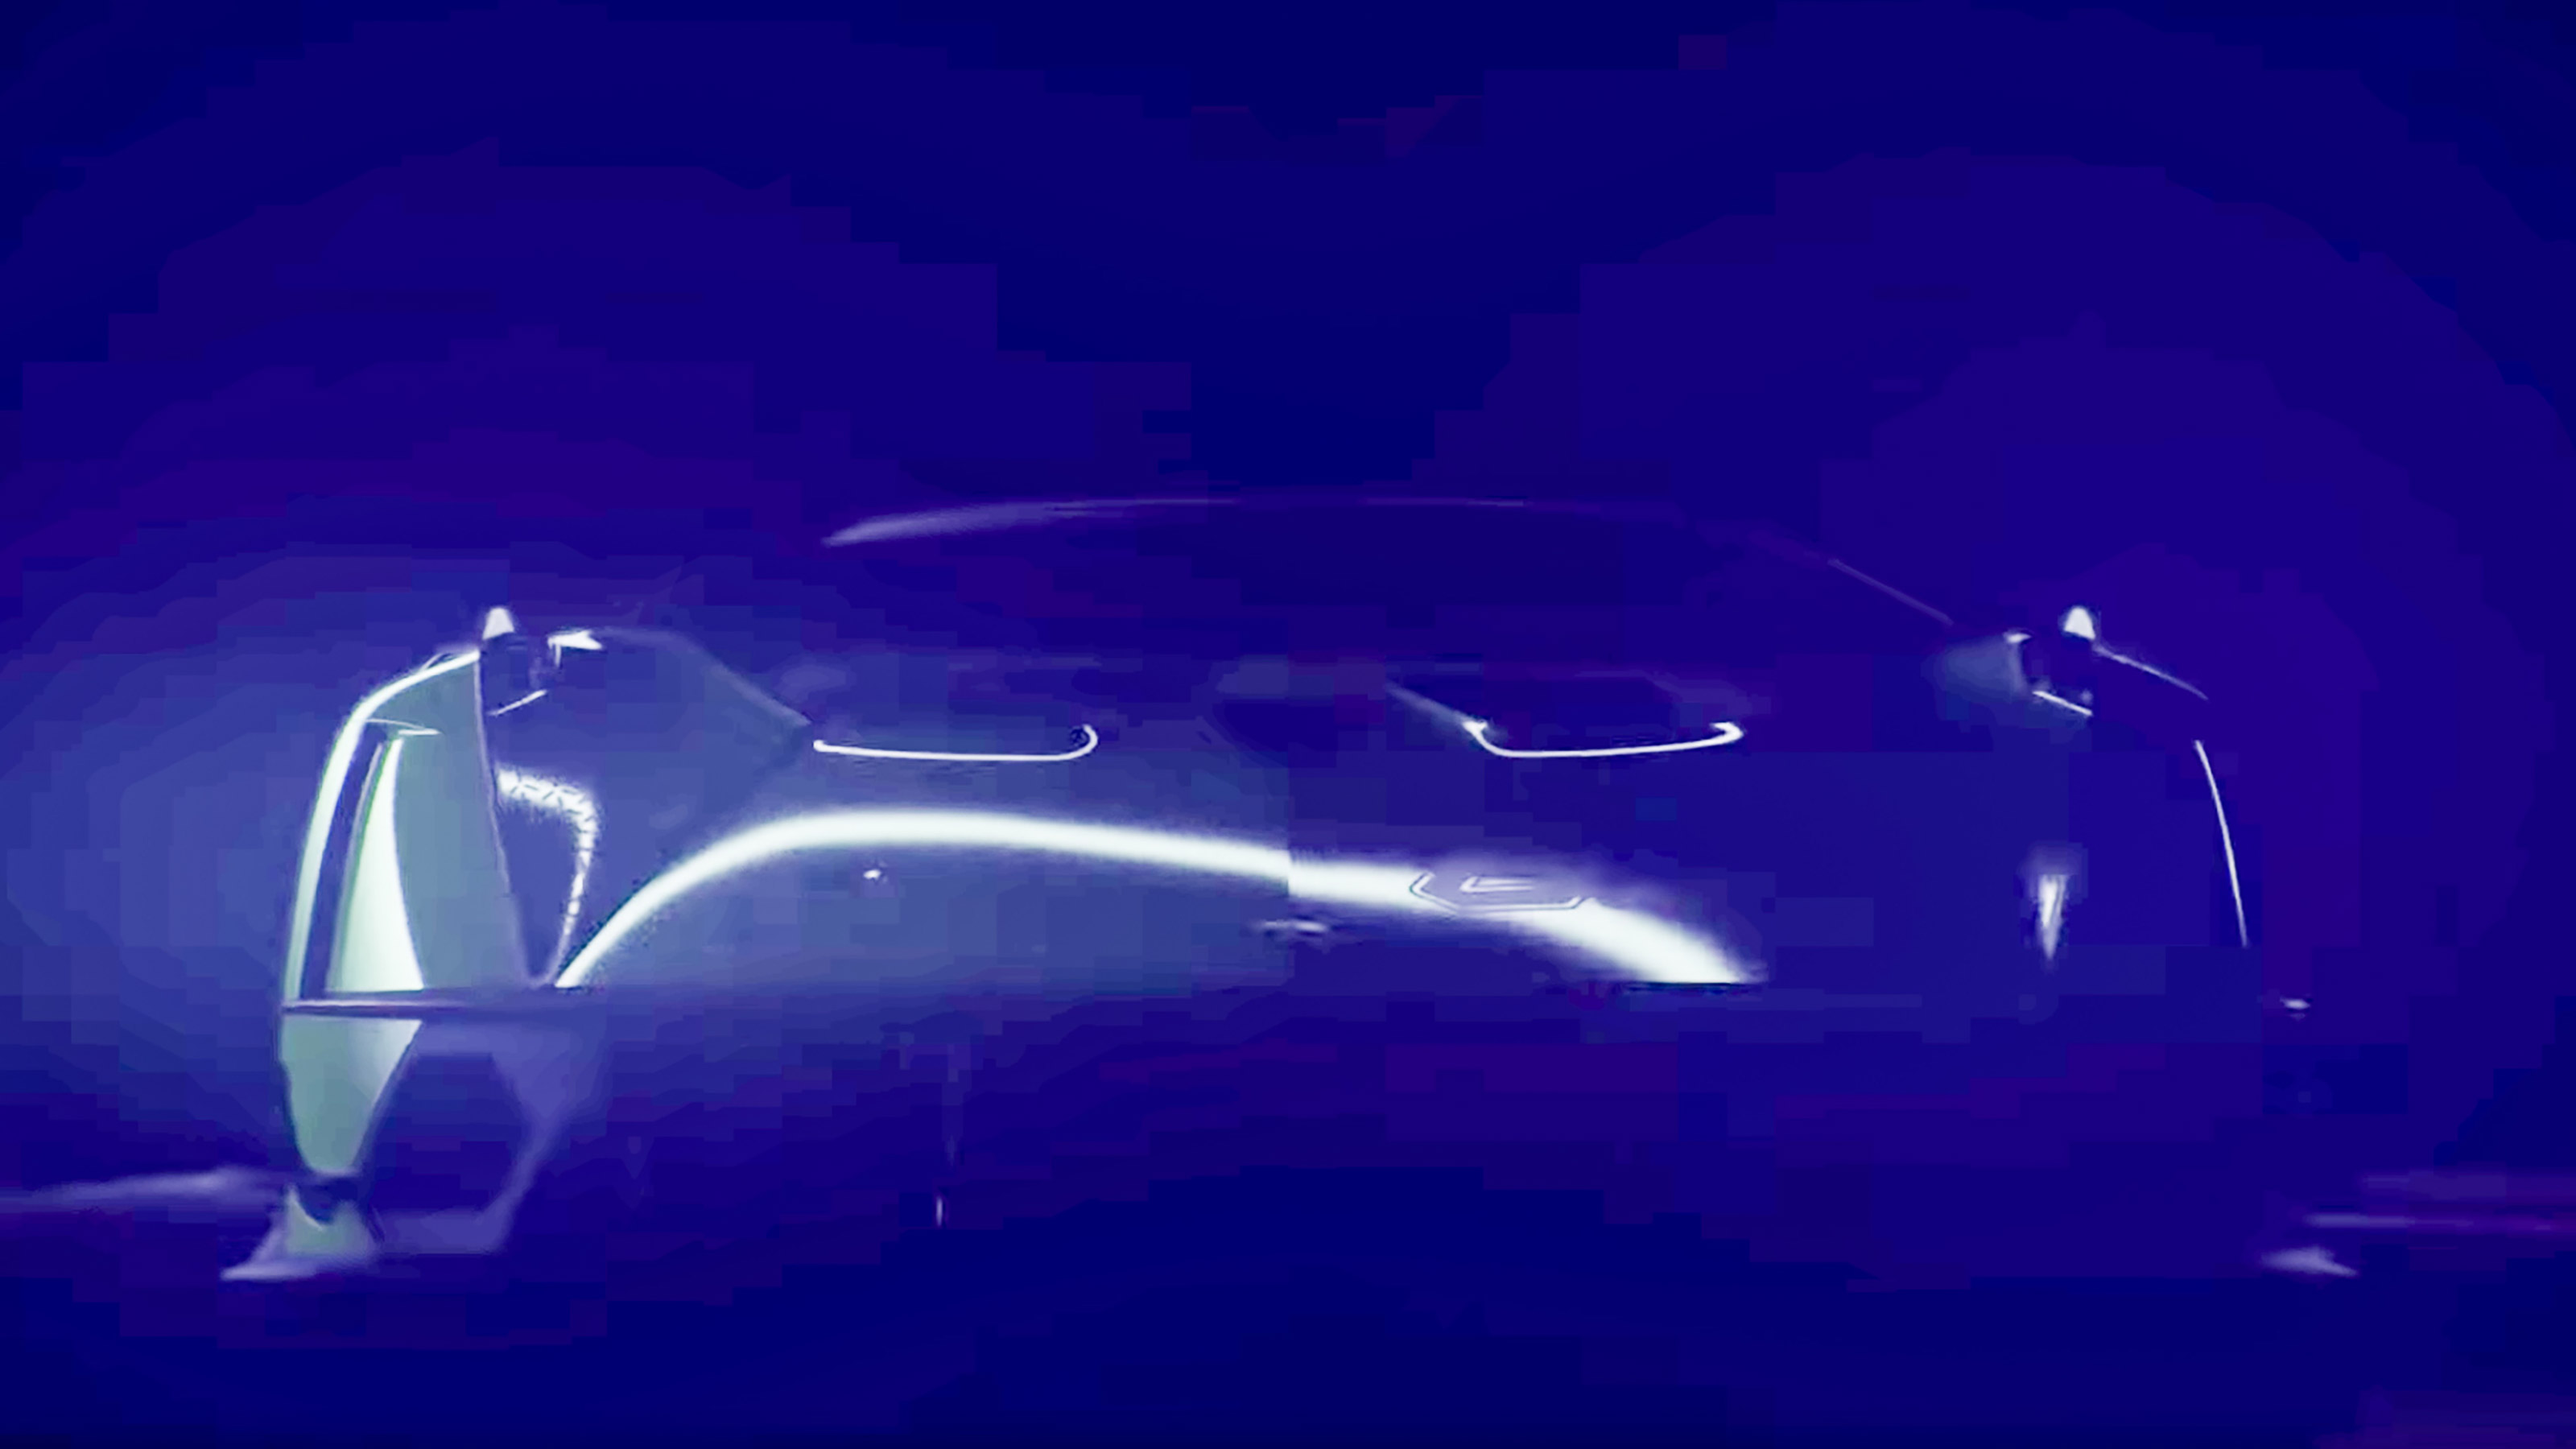 Lamborghini V12 track-only hypercar teased - pictures | evo